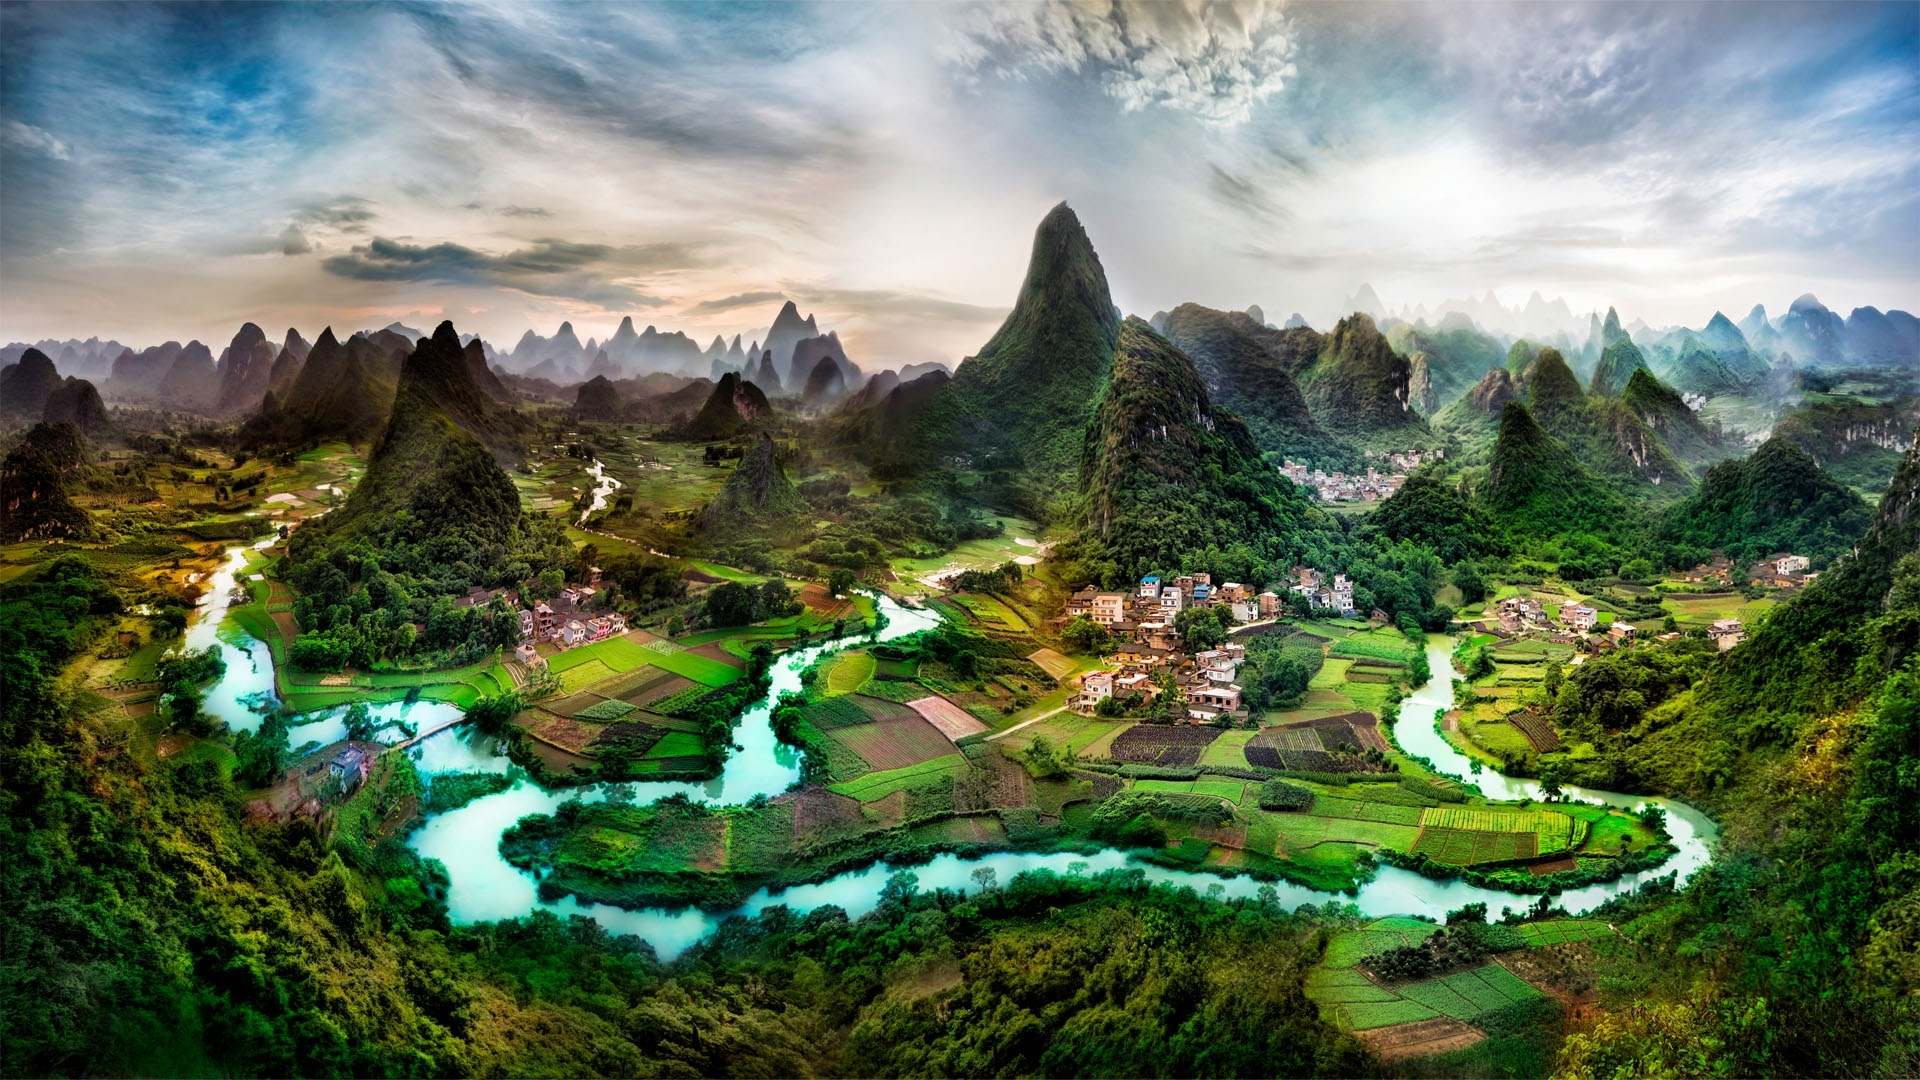 10 new landscape desktop wallpaper full hd 1080p for pc background